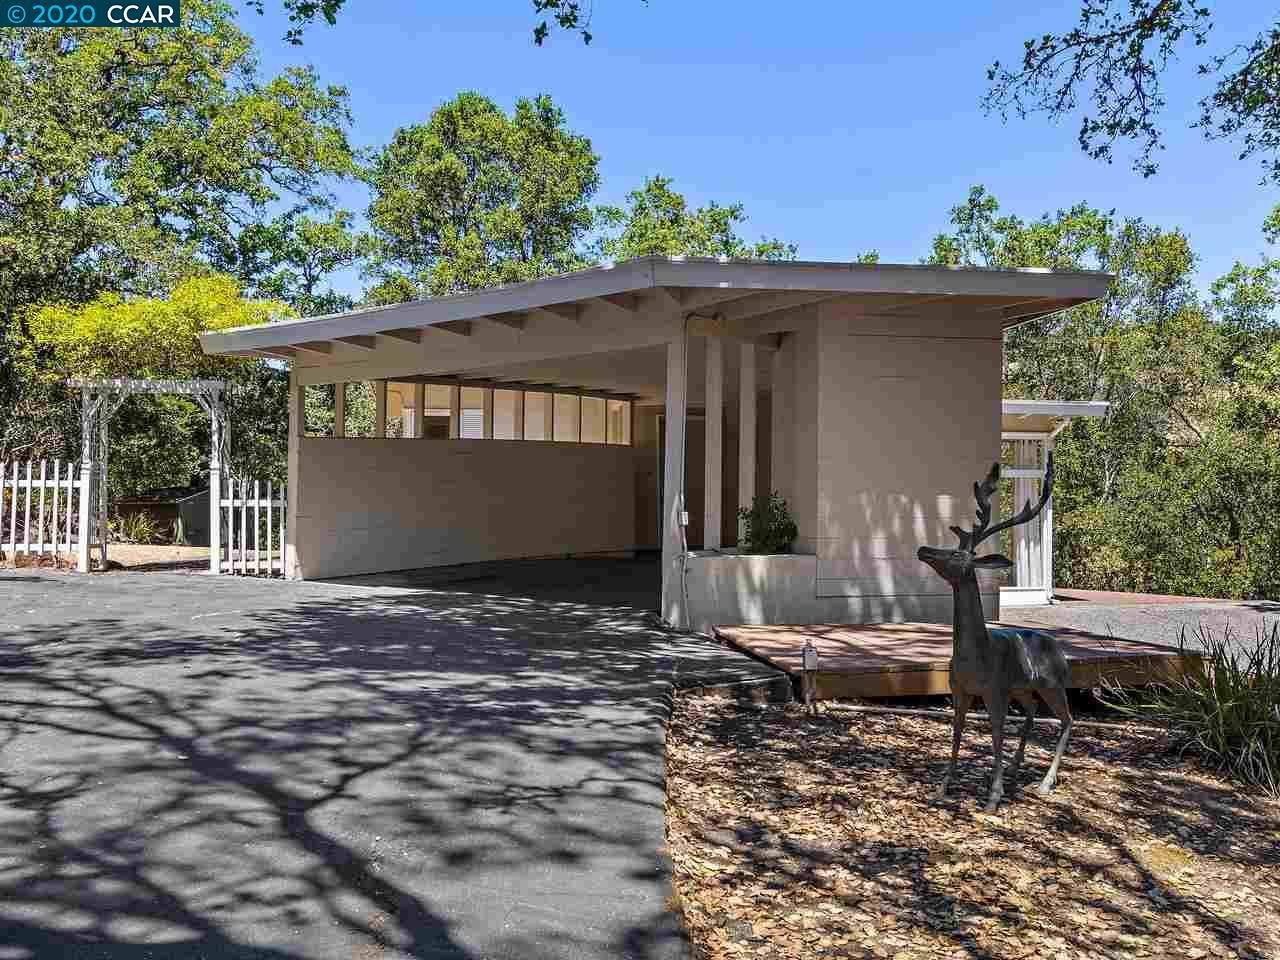 Photo of 1161 Oleander Dr, LAFAYETTE, CA 94549 (MLS # 40914958)